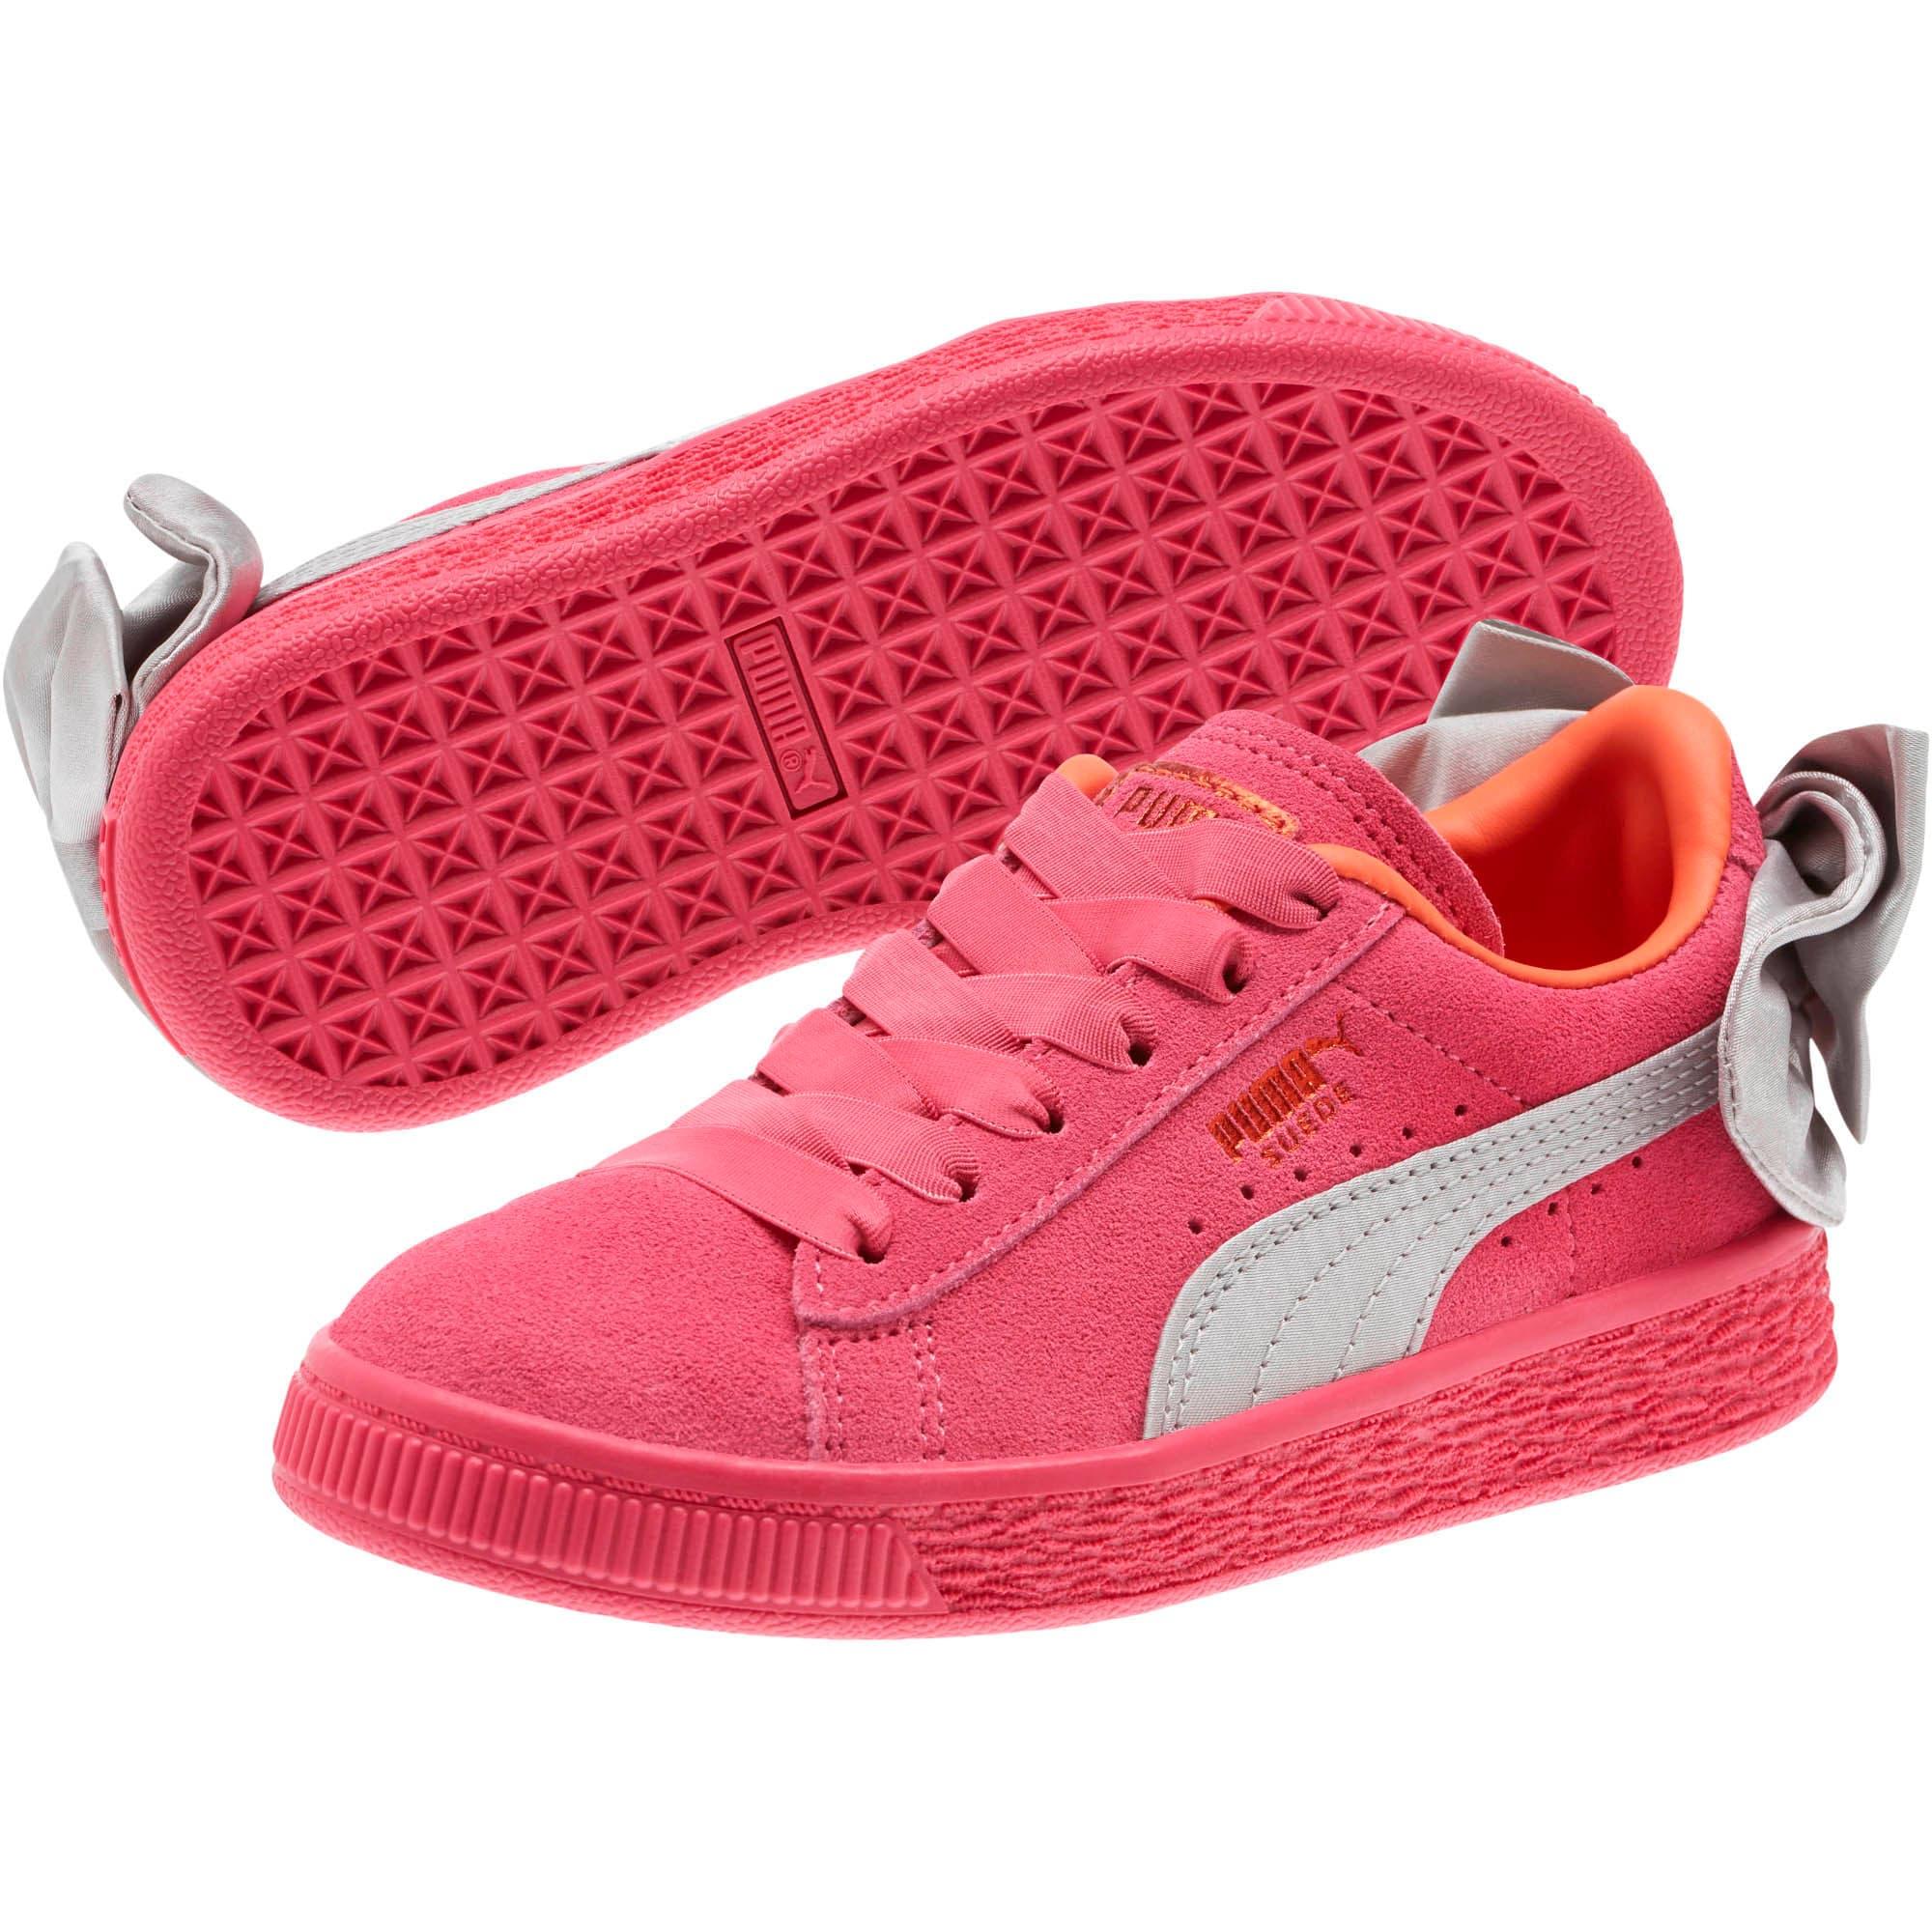 Miniatura 2 de Zapatos Suede Bow AC para niños pequeños, Fuchsia Purple-Nasturtium, mediano